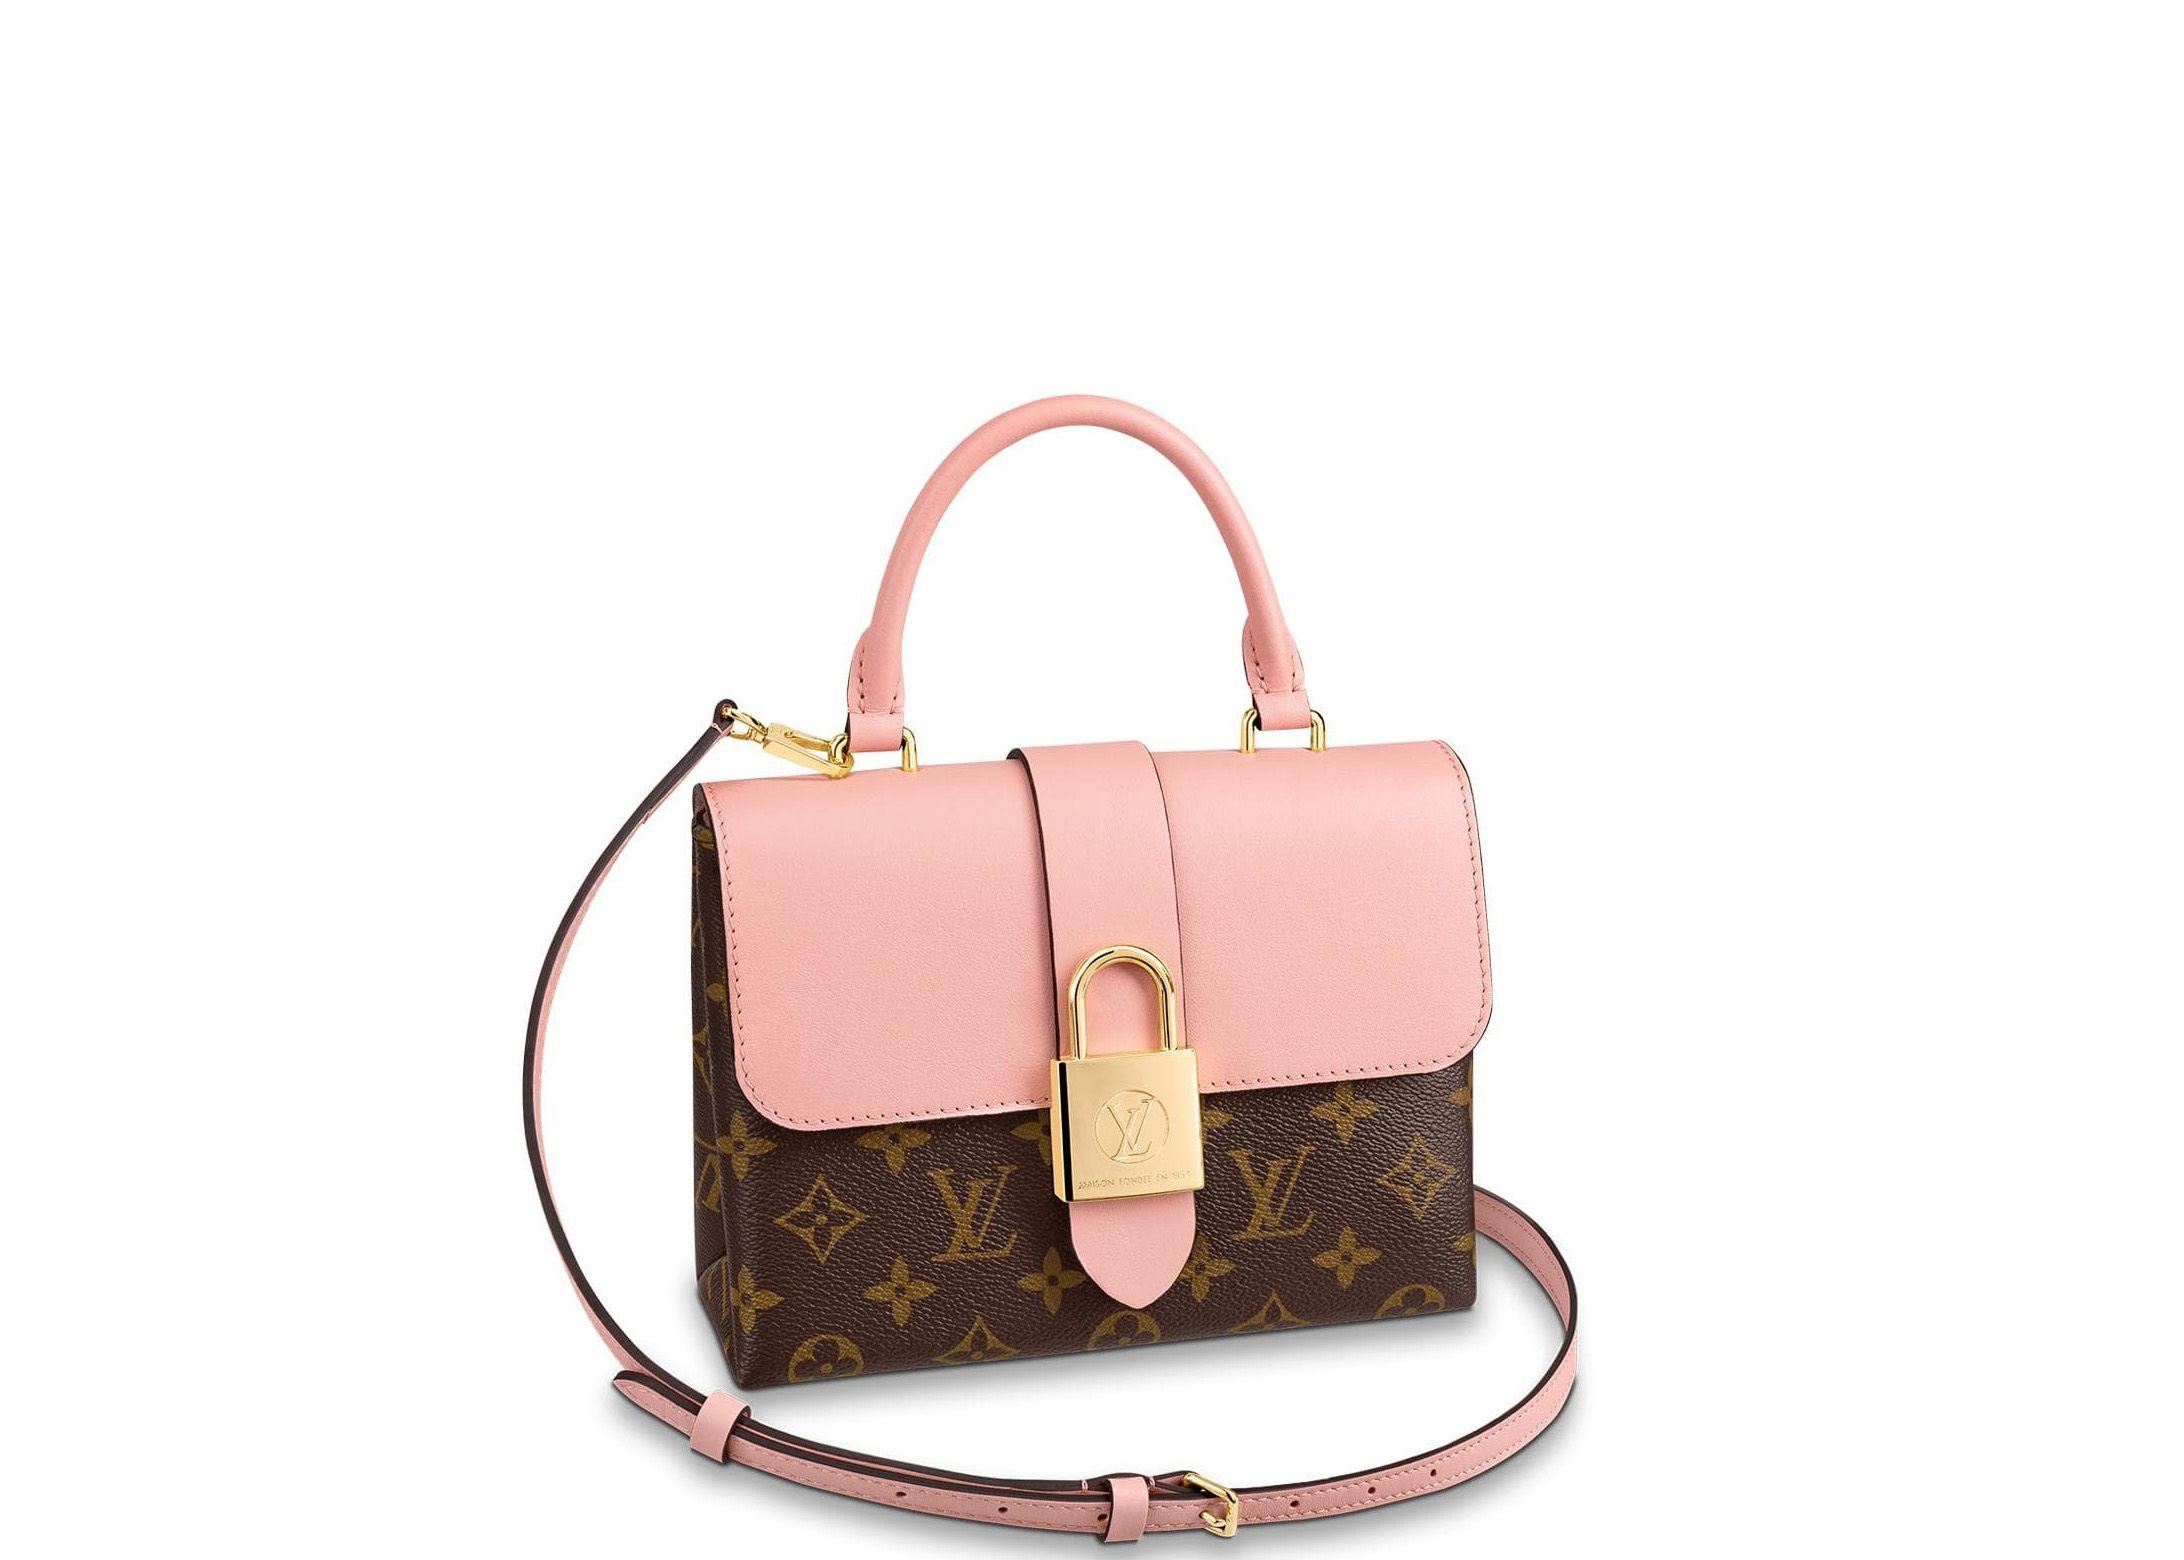 Pre Owned Louis Vuitton Locky Monogram Bb Rose Poudre Modesens Louis Vuitton Pre Owned Louis Vuitton Vuitton